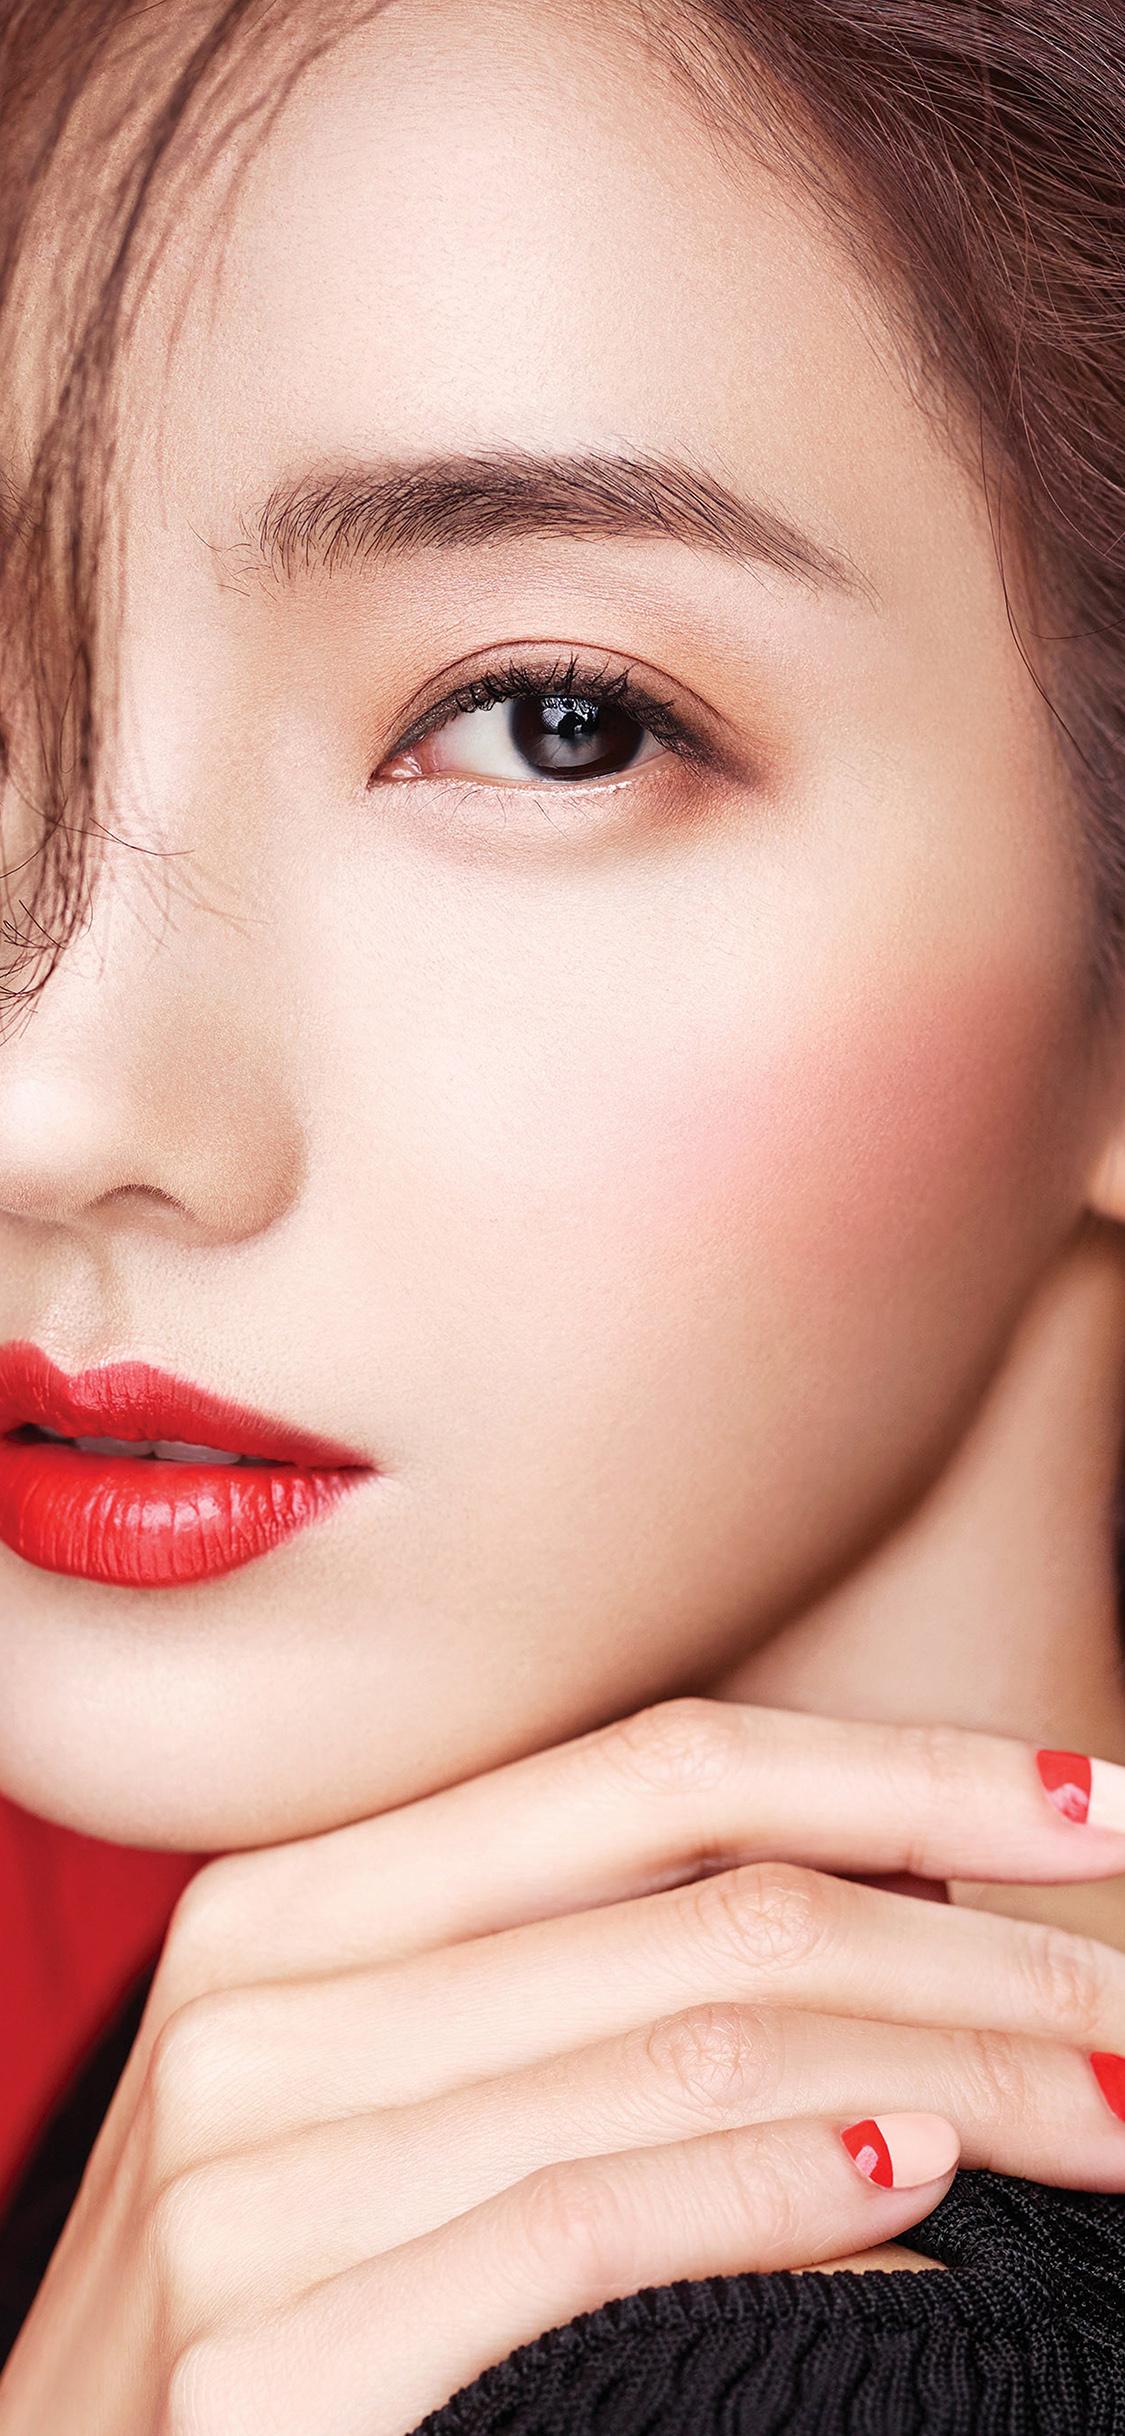 Hh56-kpop-girl-chaeyoung-cute-beauty-wallpaper